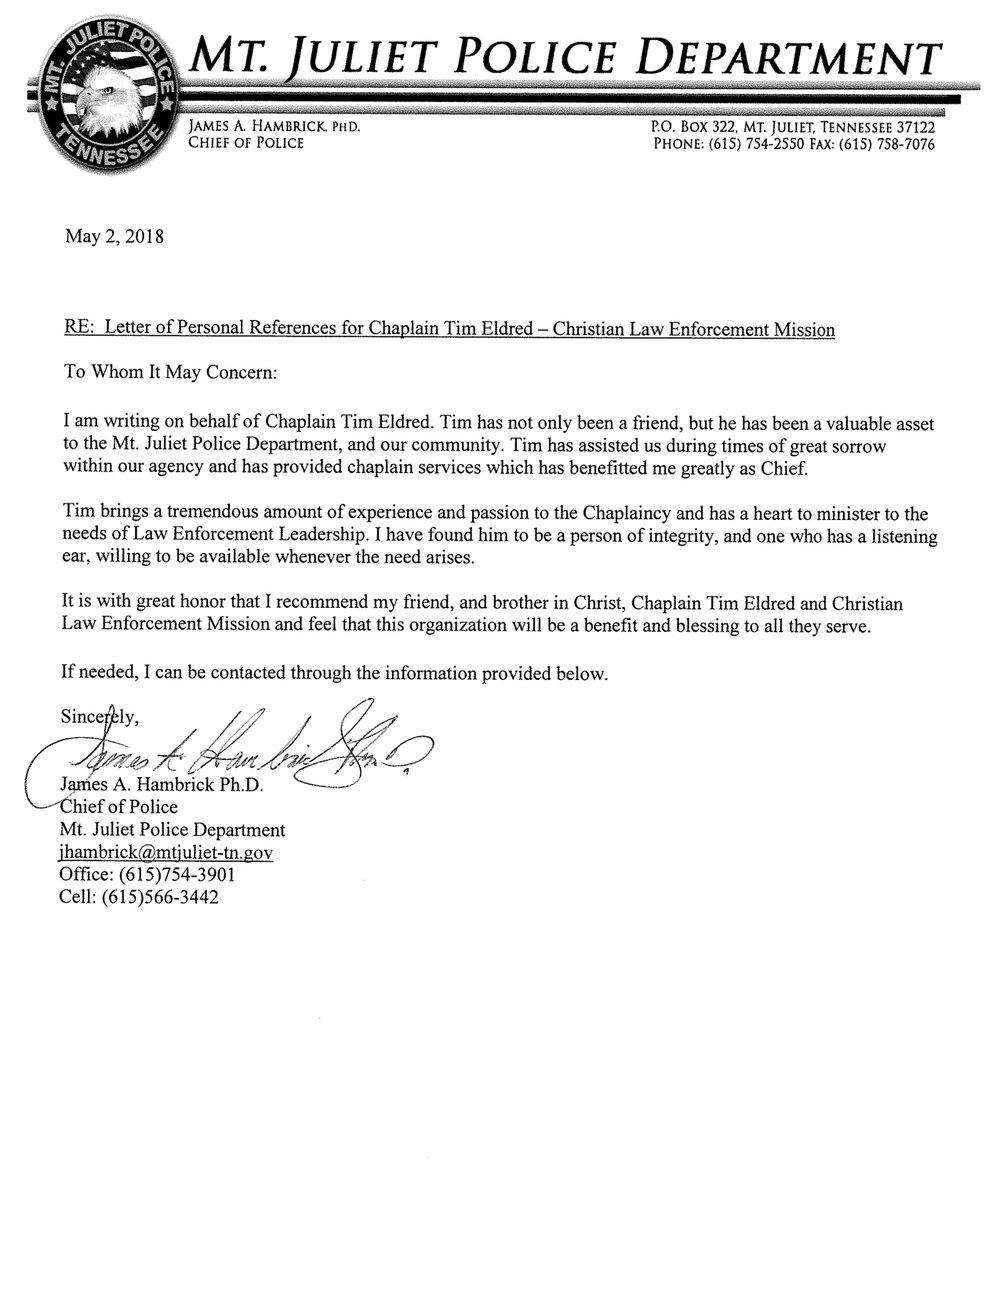 James Hambrick PhD Letter.jpg